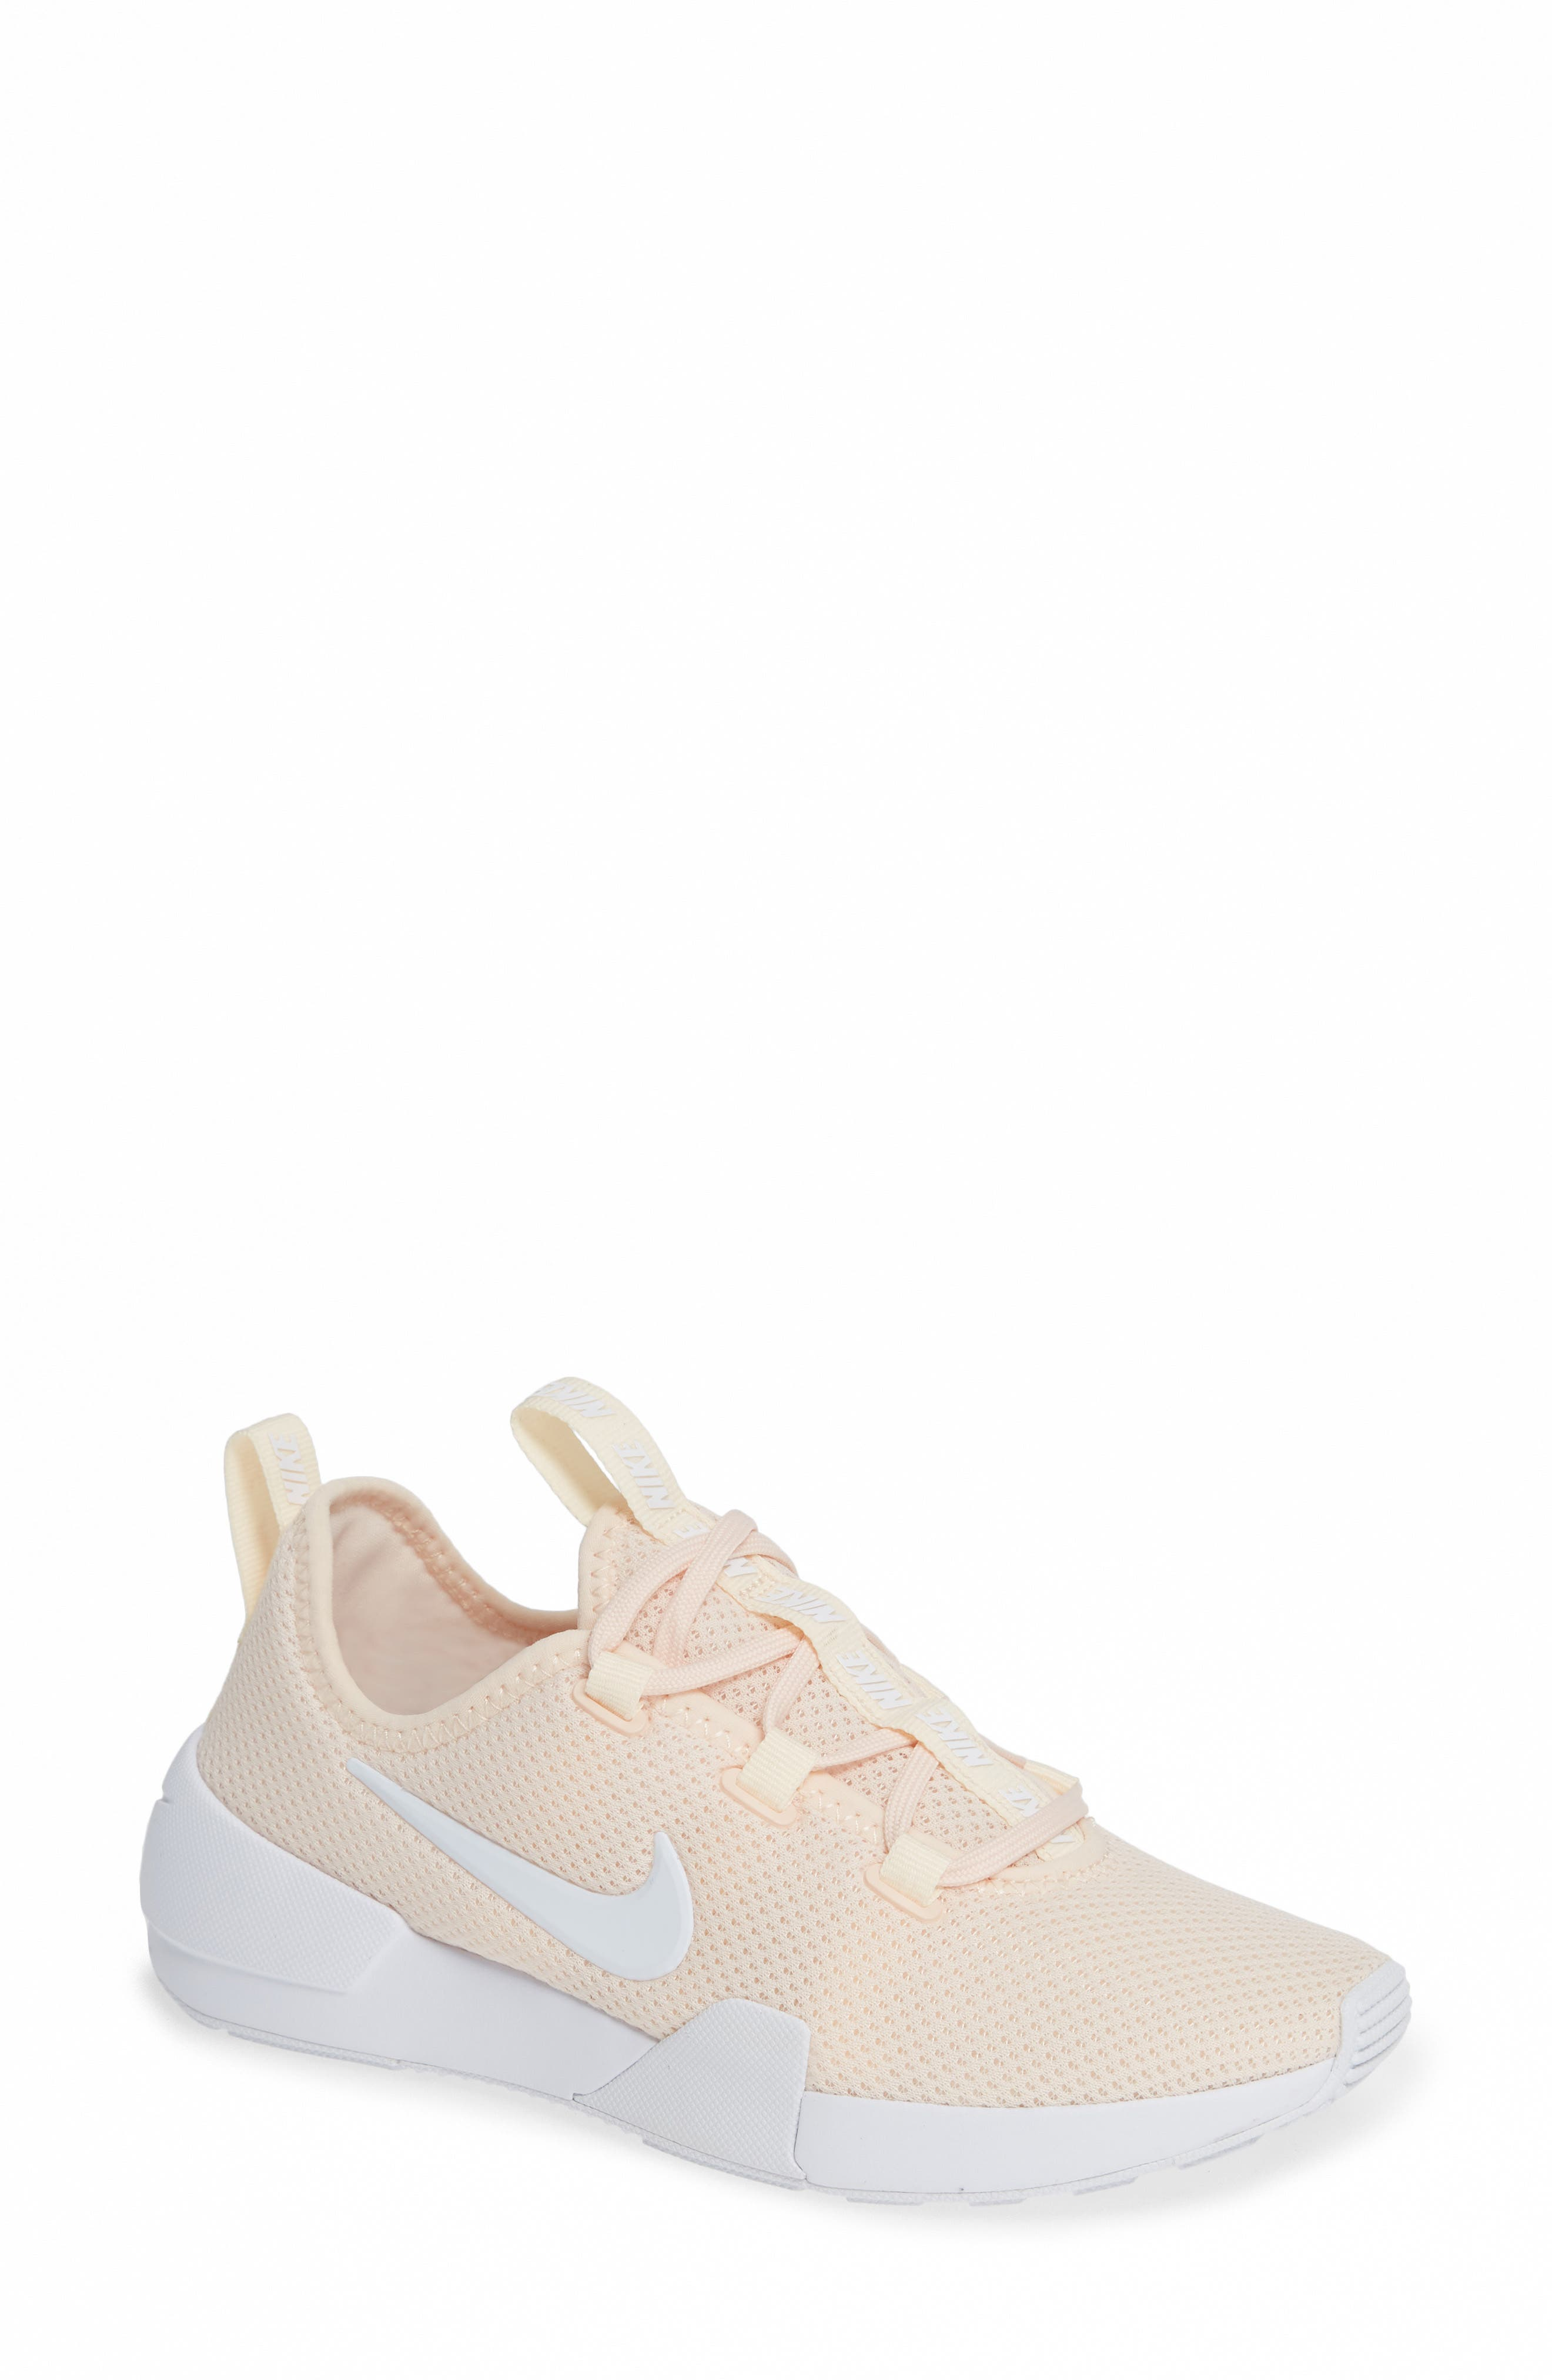 Ashin Modern Shoe,                         Main,                         color, Guava Ice/ White/ White